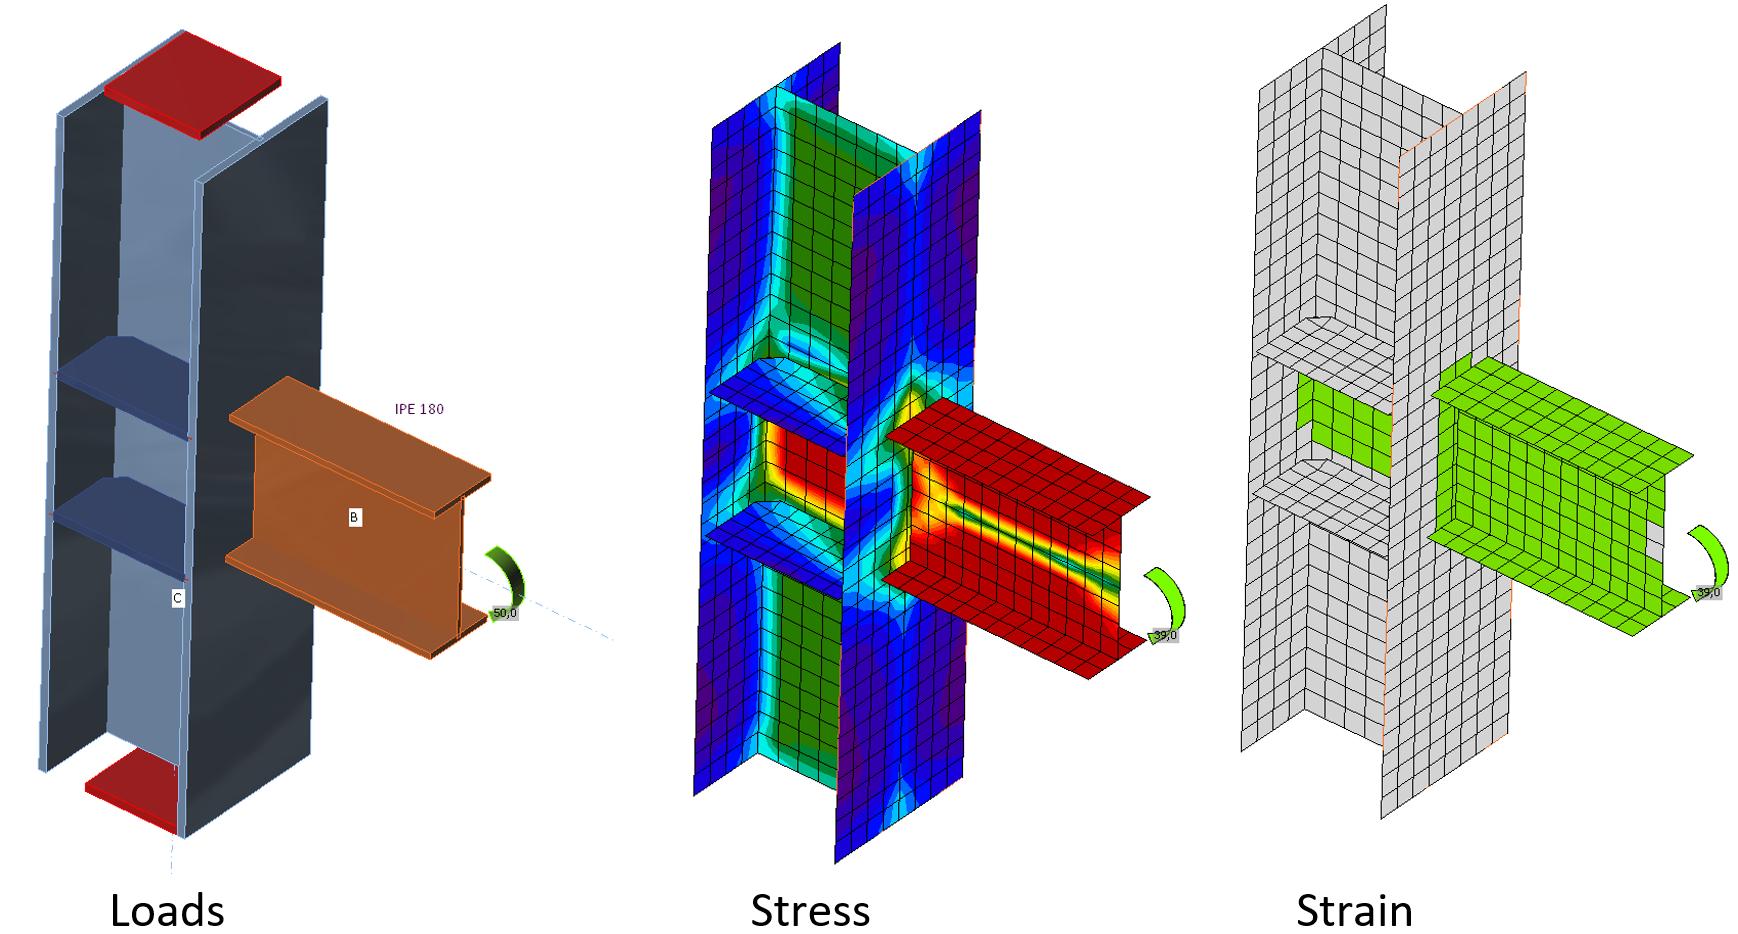 knoopbelasting, spanningsweergave in platen en rekweergave in IDEA CONNECTION